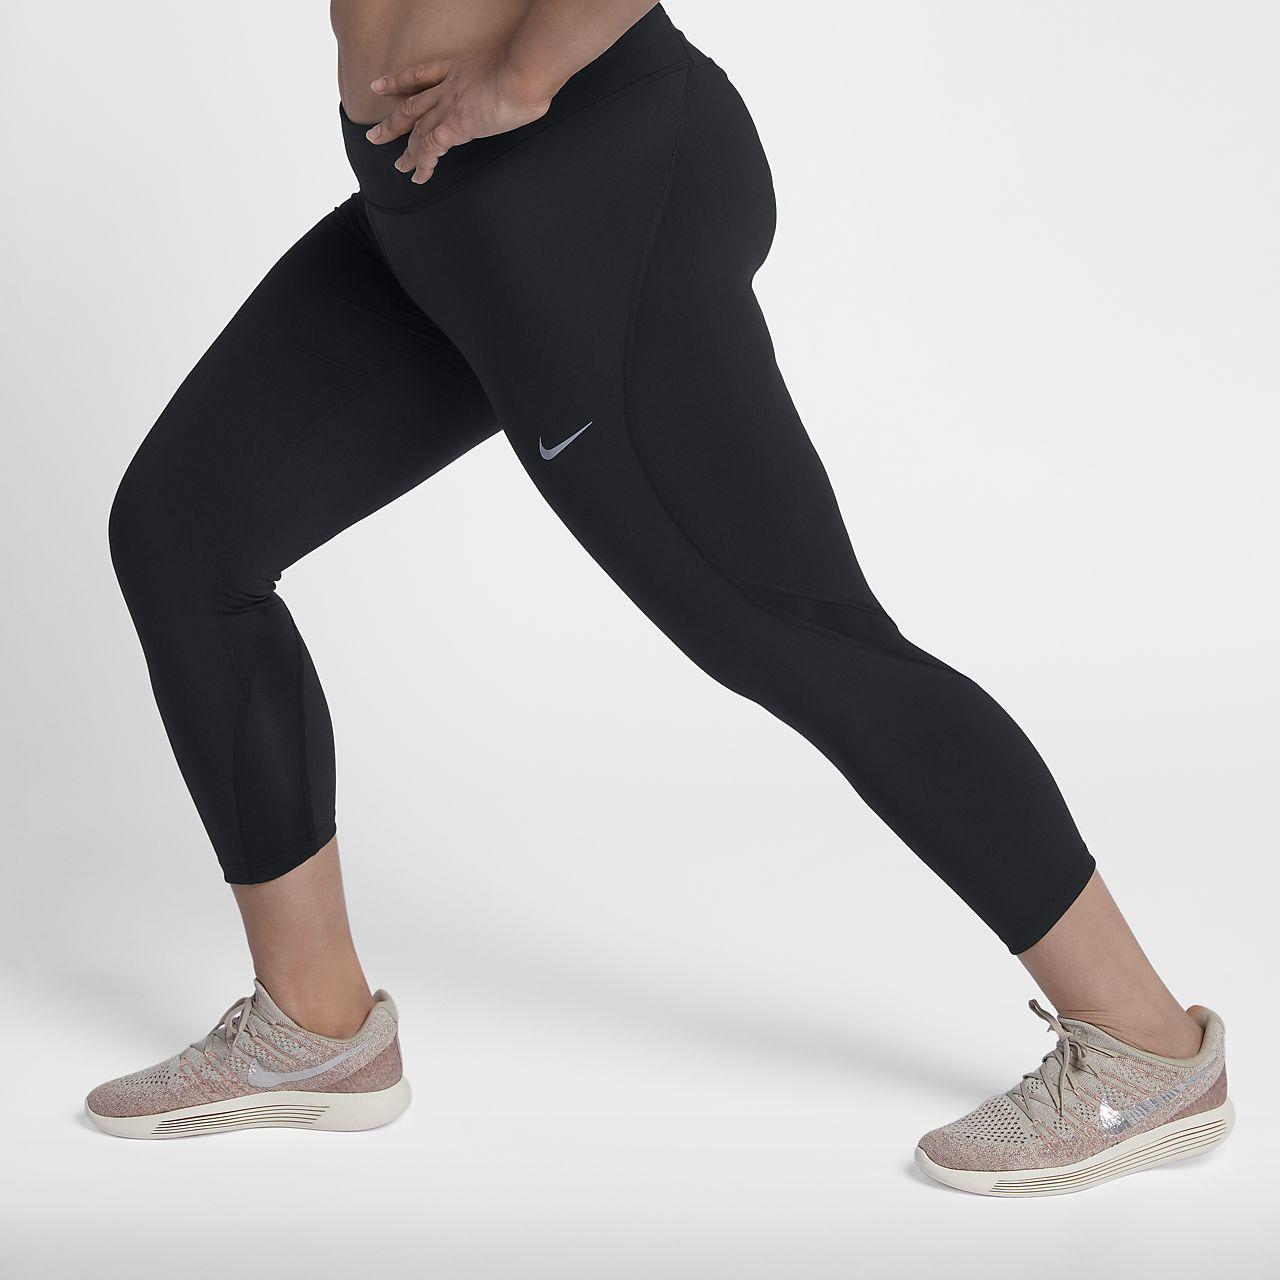 57cb2036378 Nike Epic Lux (Plus Size) Women s Running Crops. Nike.com CA